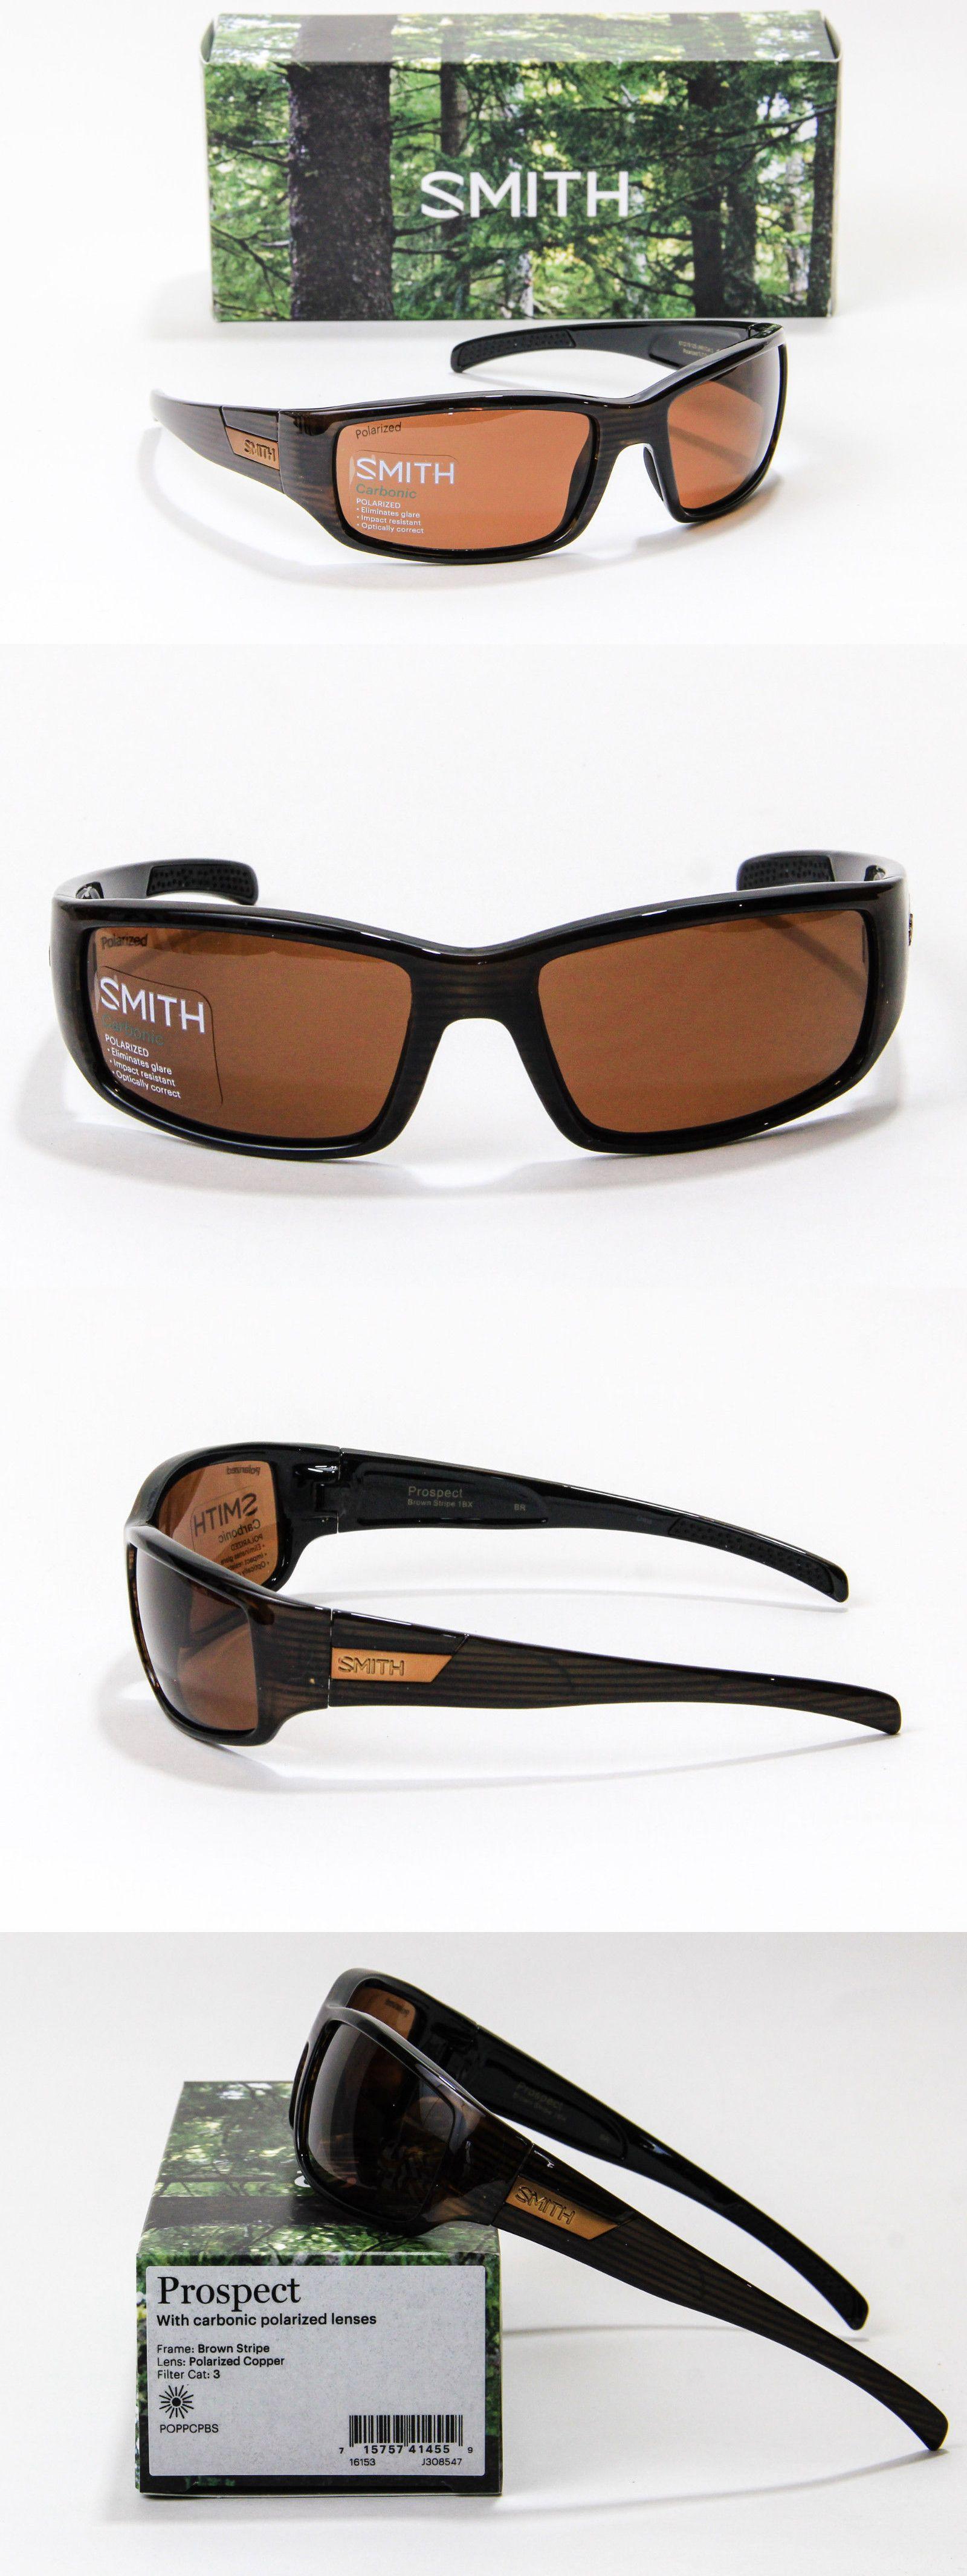 c6be02b68f Sunglasses 79720  New Smith Prospect Polarized Sunglasses Brown Stripe  Frame Copper Lens -  BUY